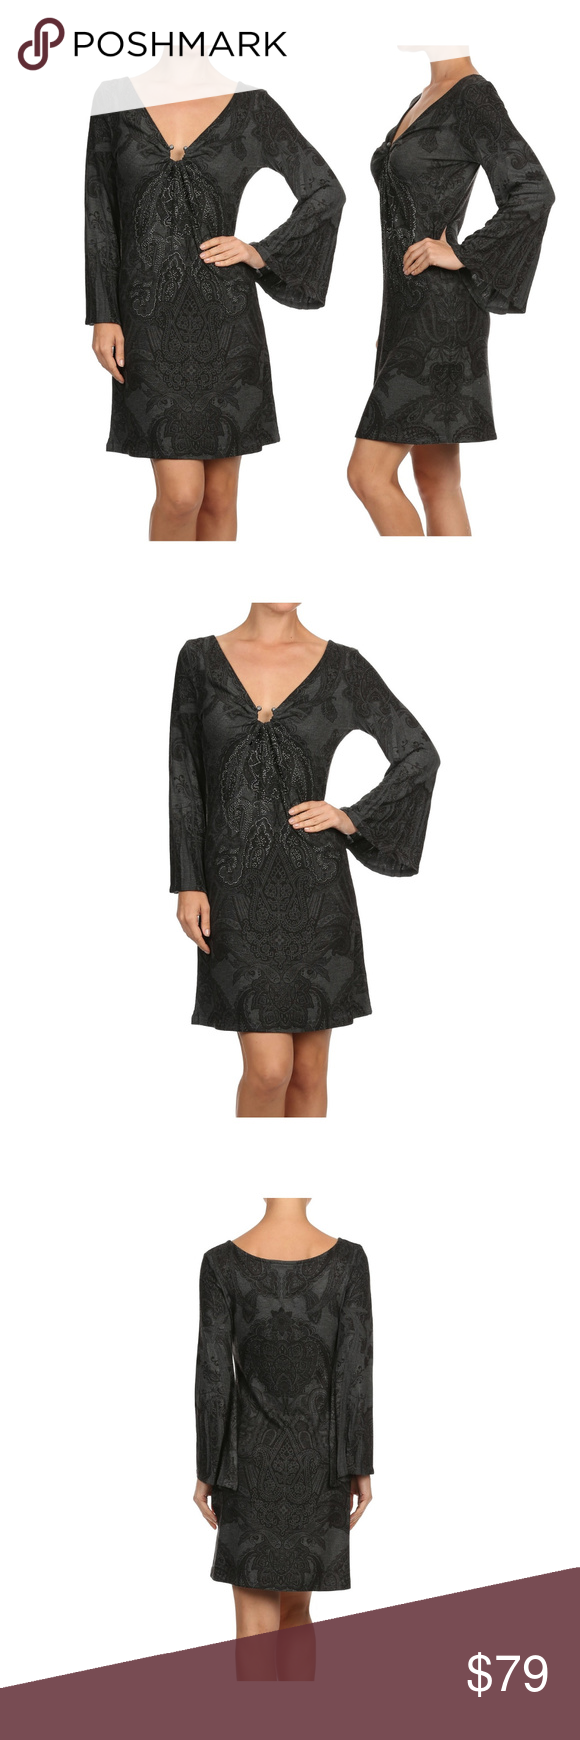 Womenus long sleeve rhinestone printed dress boutique printing